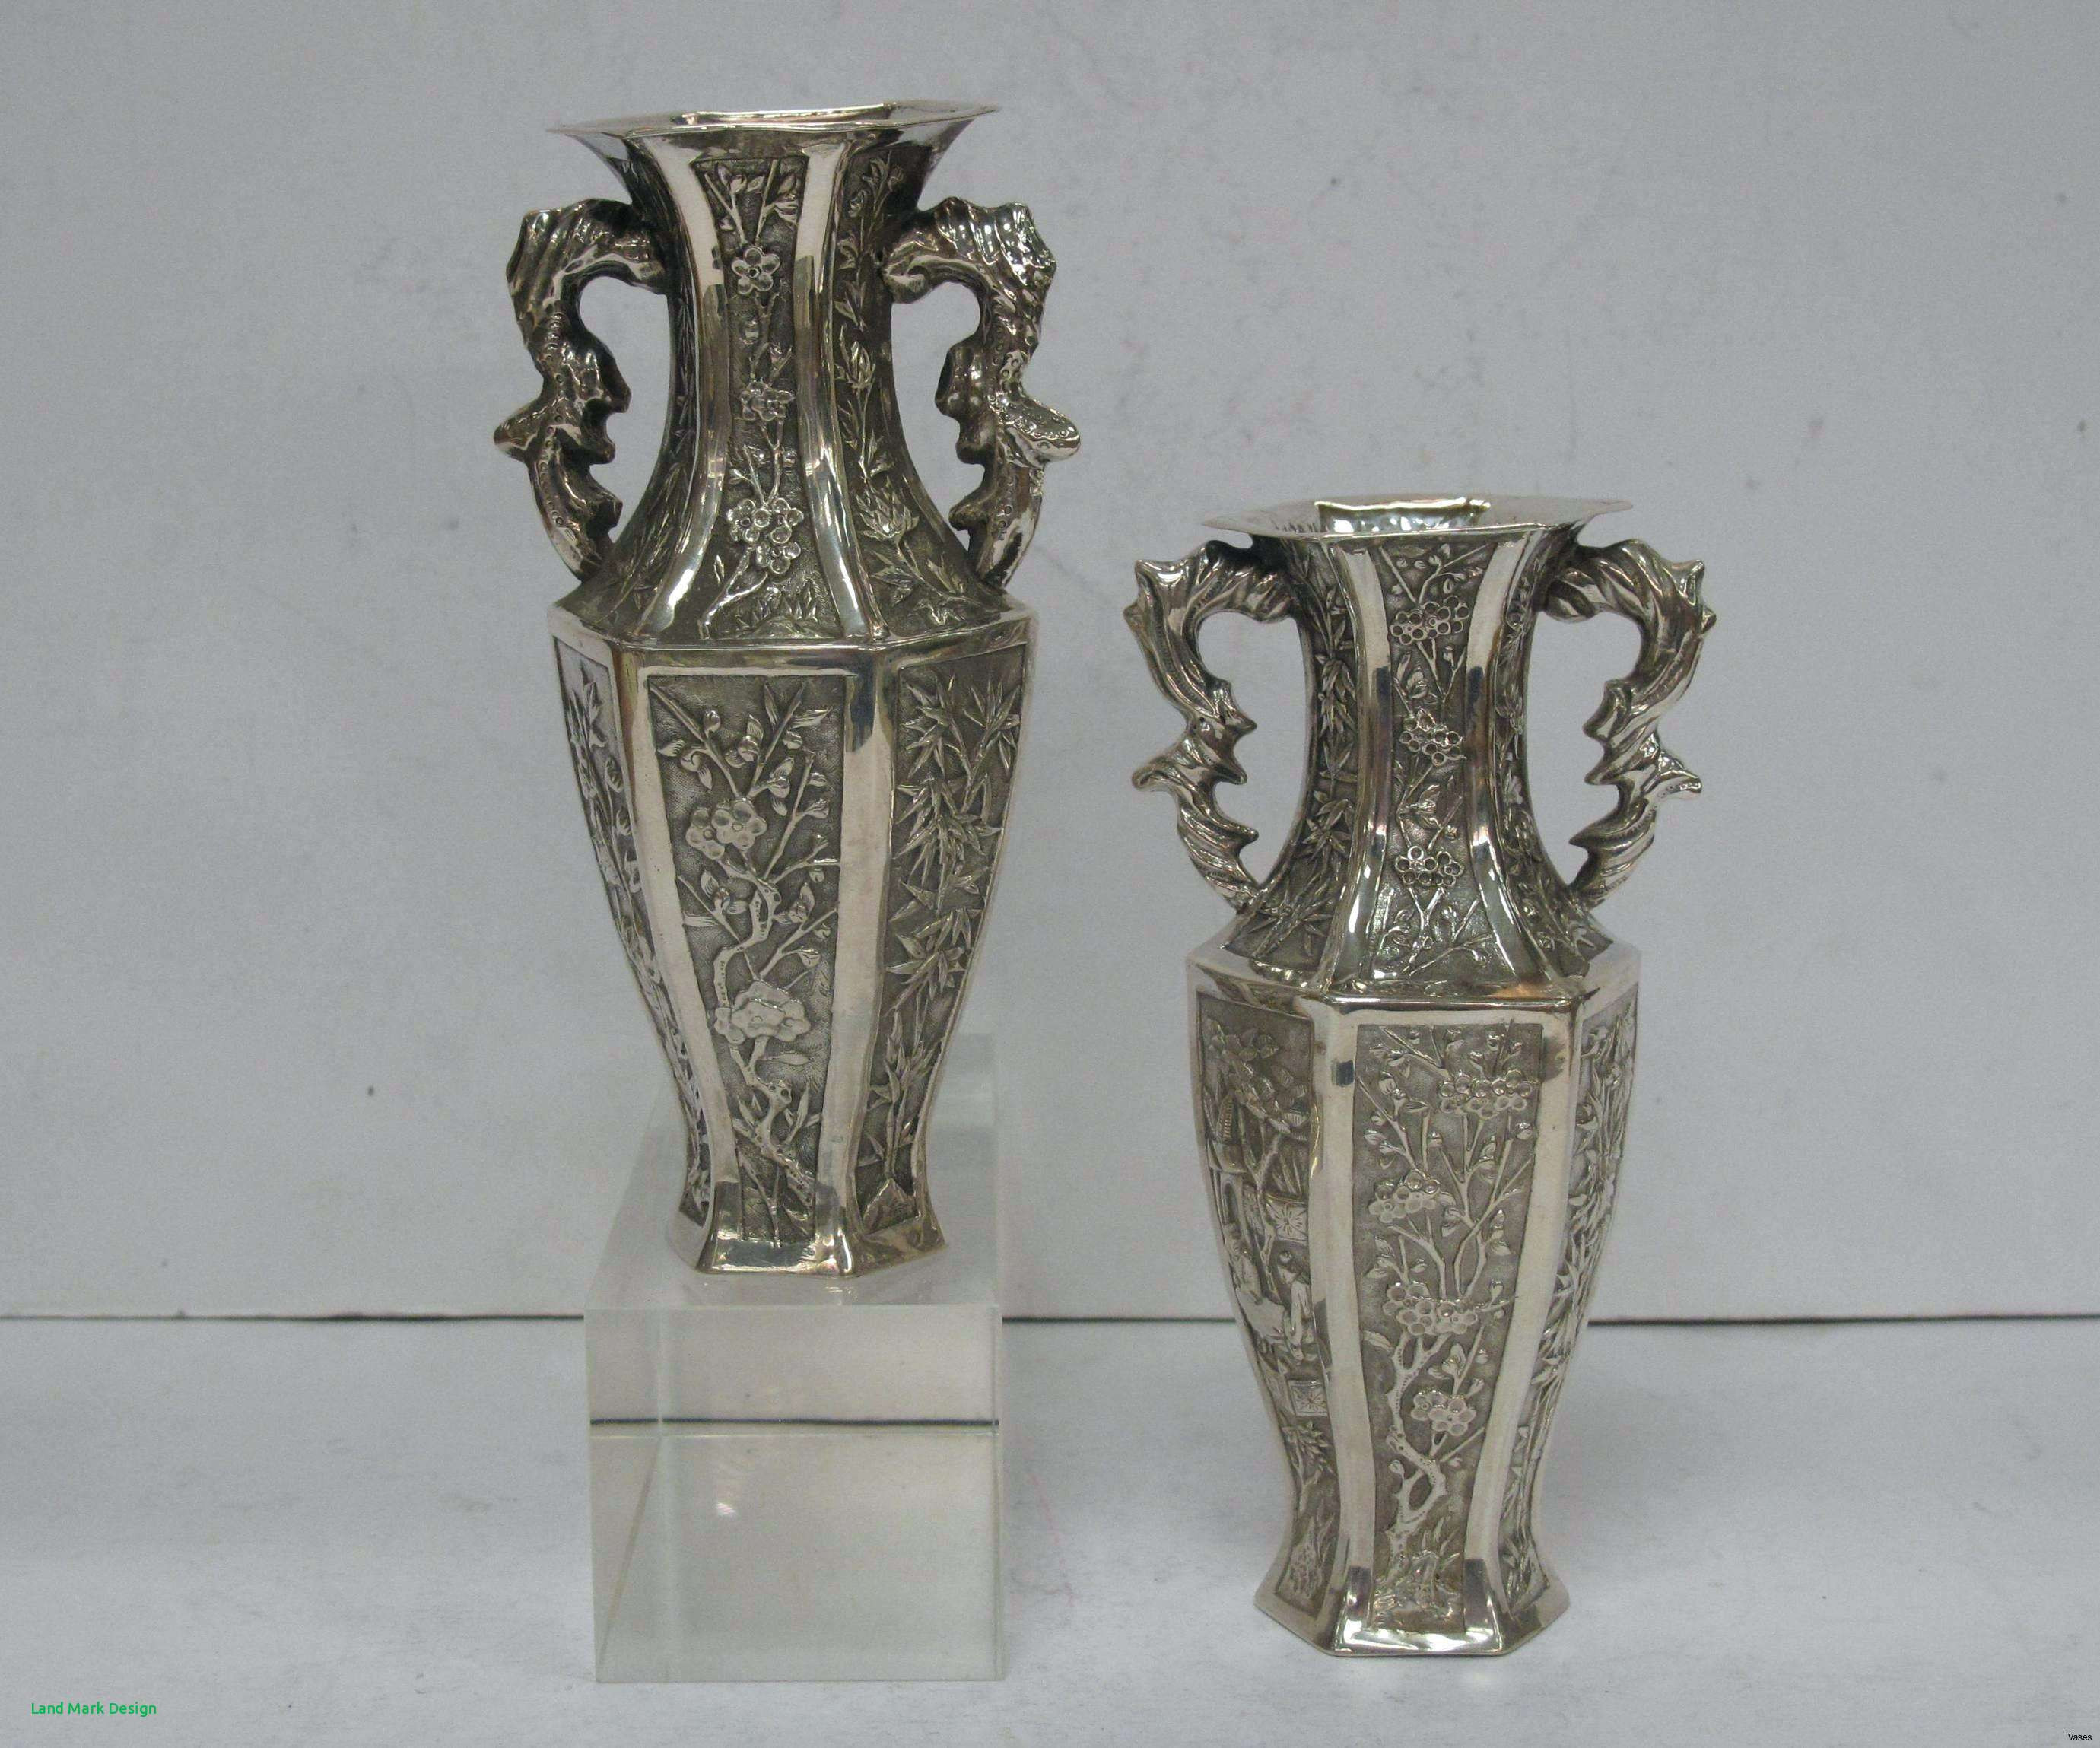 clear vases bulk of unique crystal vase awards beginneryogaclassesnear me intended for 8253h vases bulk silver square glass cube vase with metallic band 6x6i 0d vases bulk silver